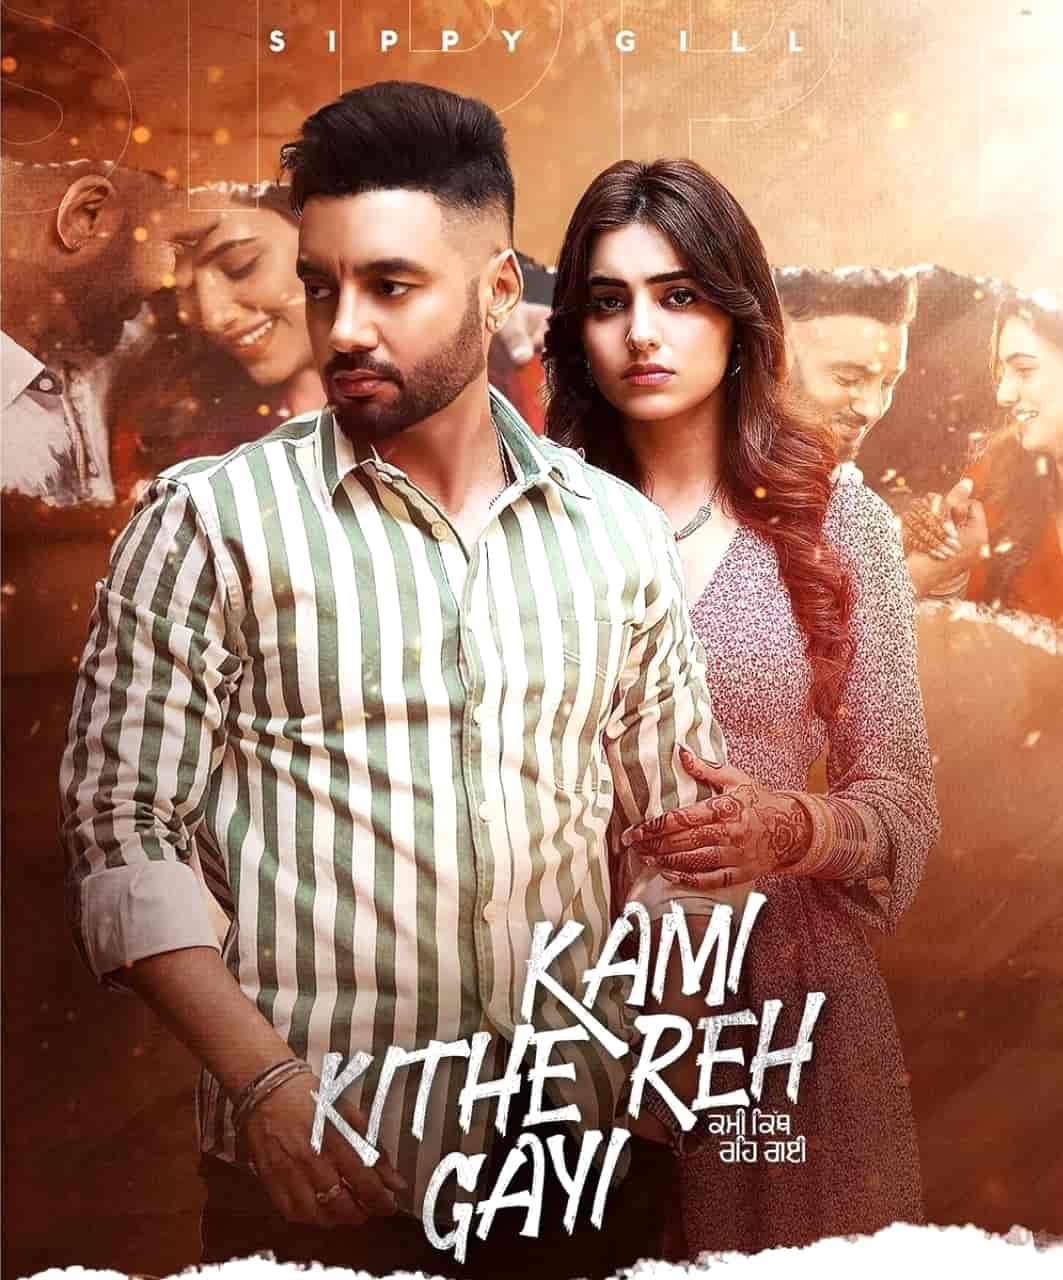 Kami Kithe Reh Gayi Punjabi Song Lyrics Sippy Gill